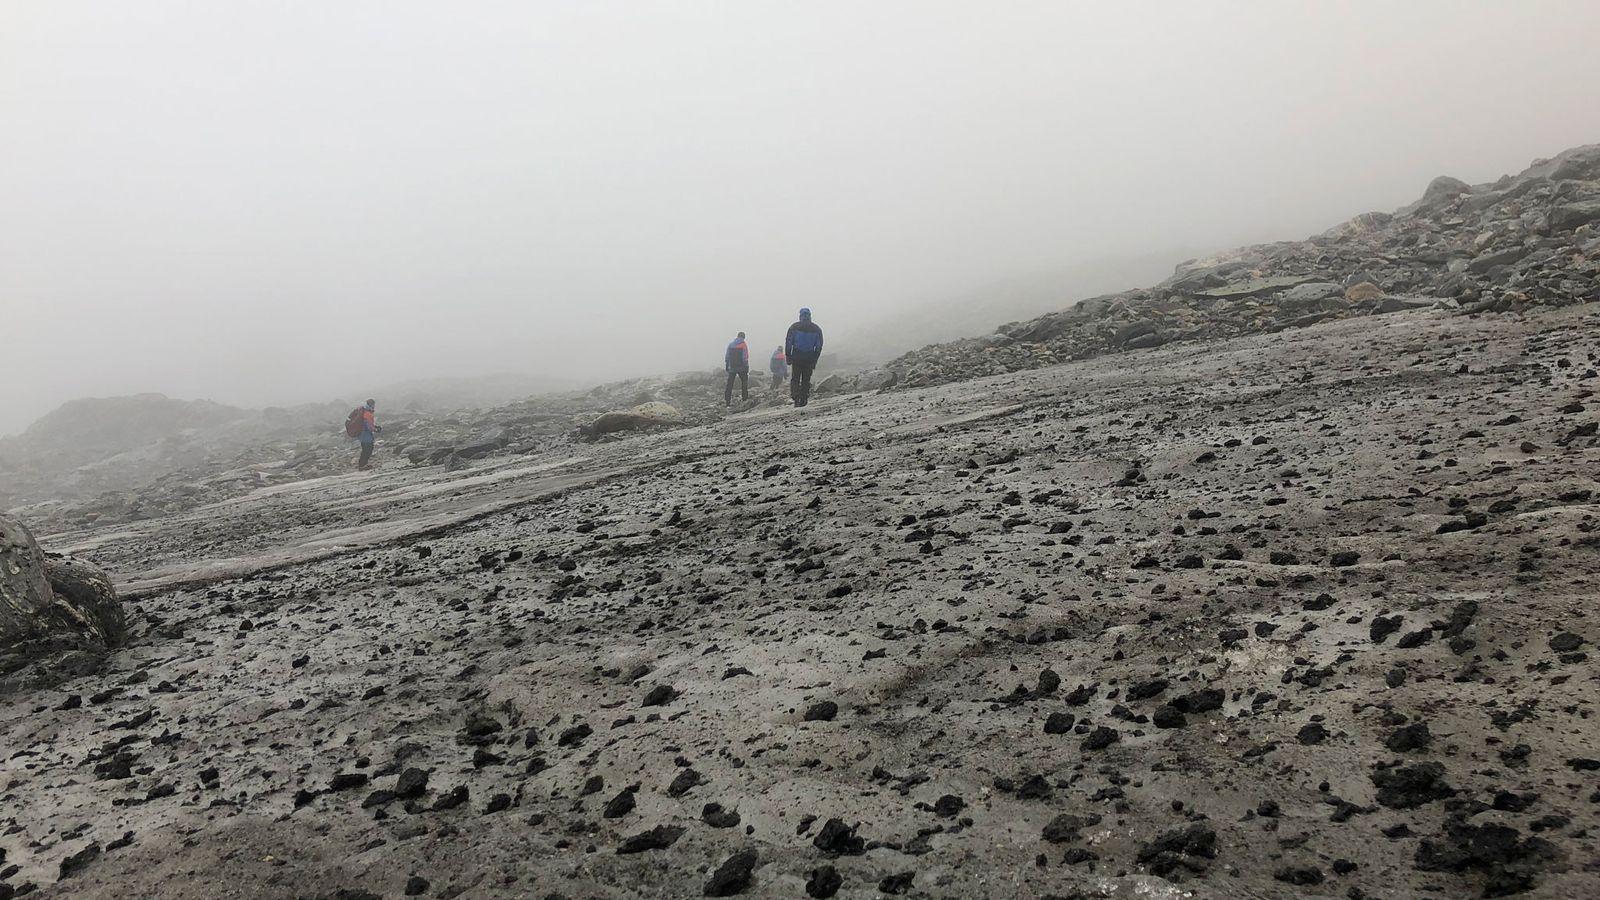 A mancha de gelo de Lendbreen, na Noruega, vista aqui numa fotografia captada em 2019, está ...